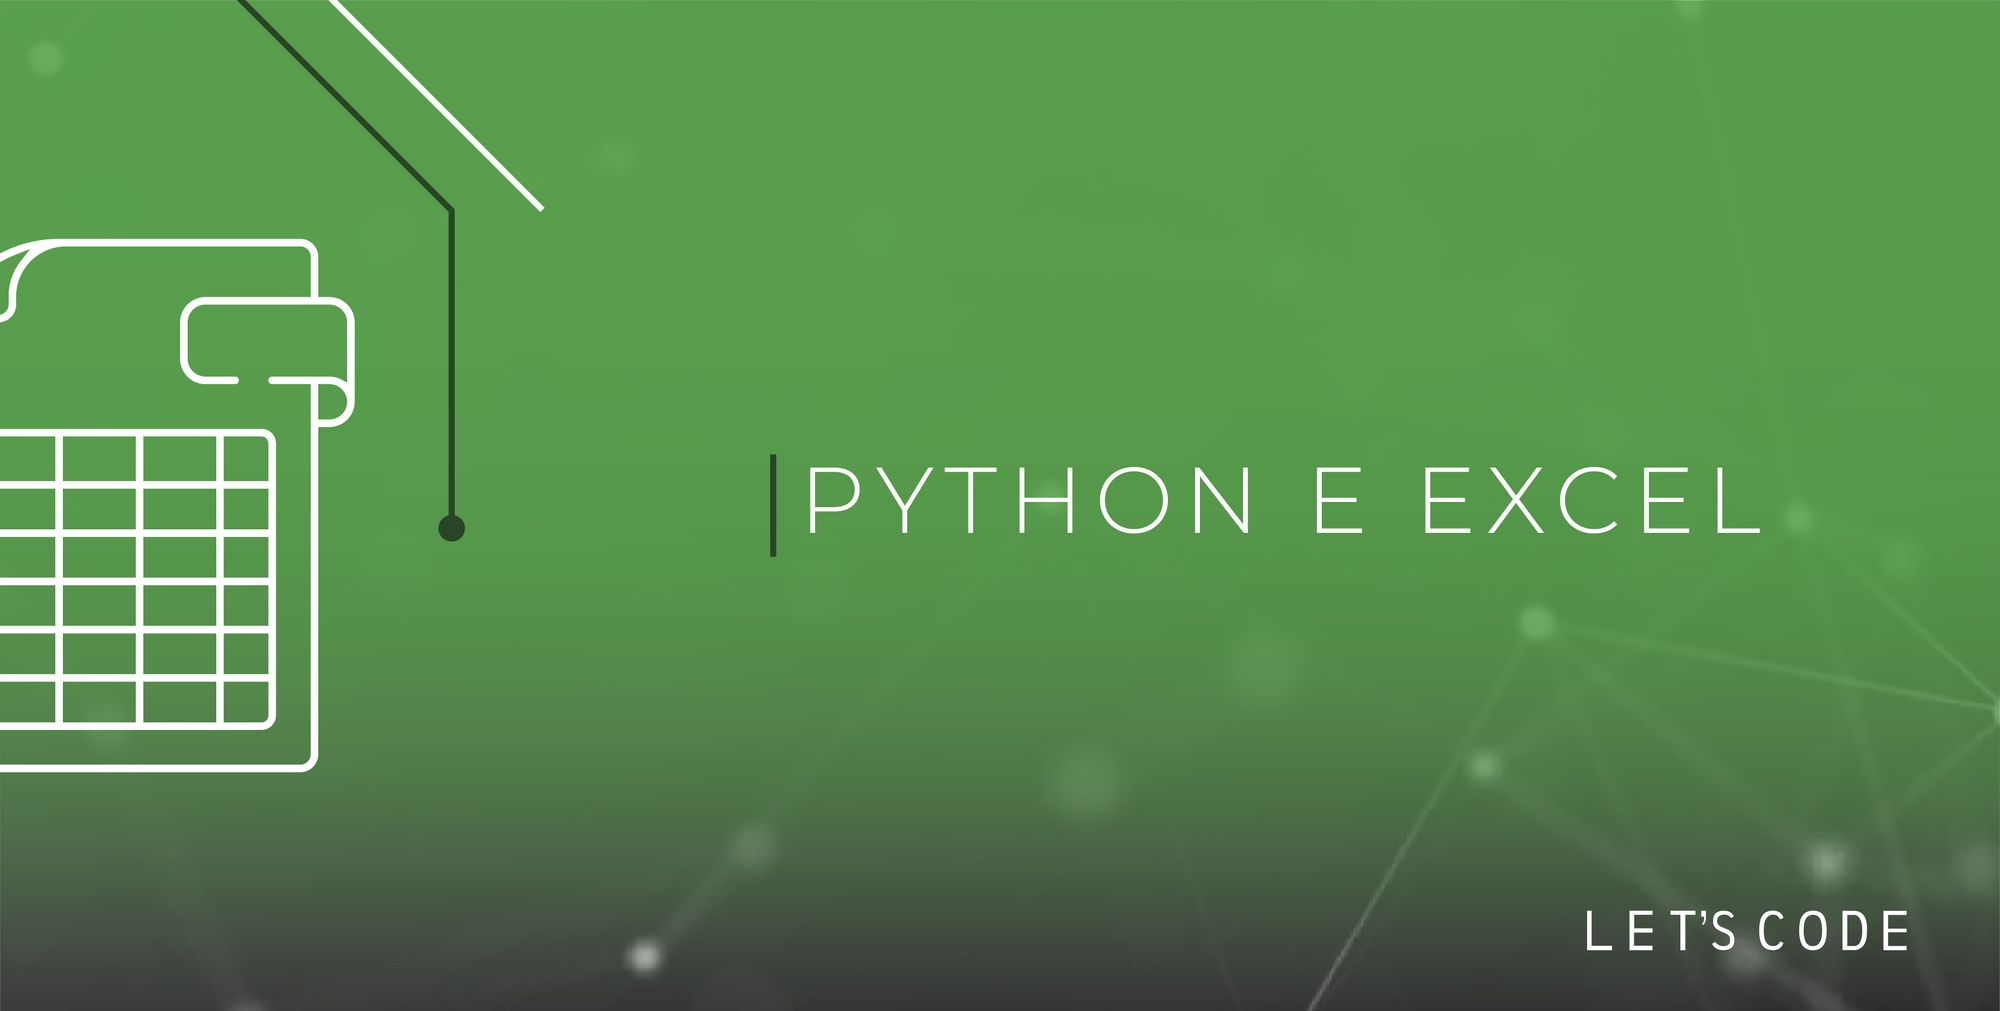 Let's Code Blog post